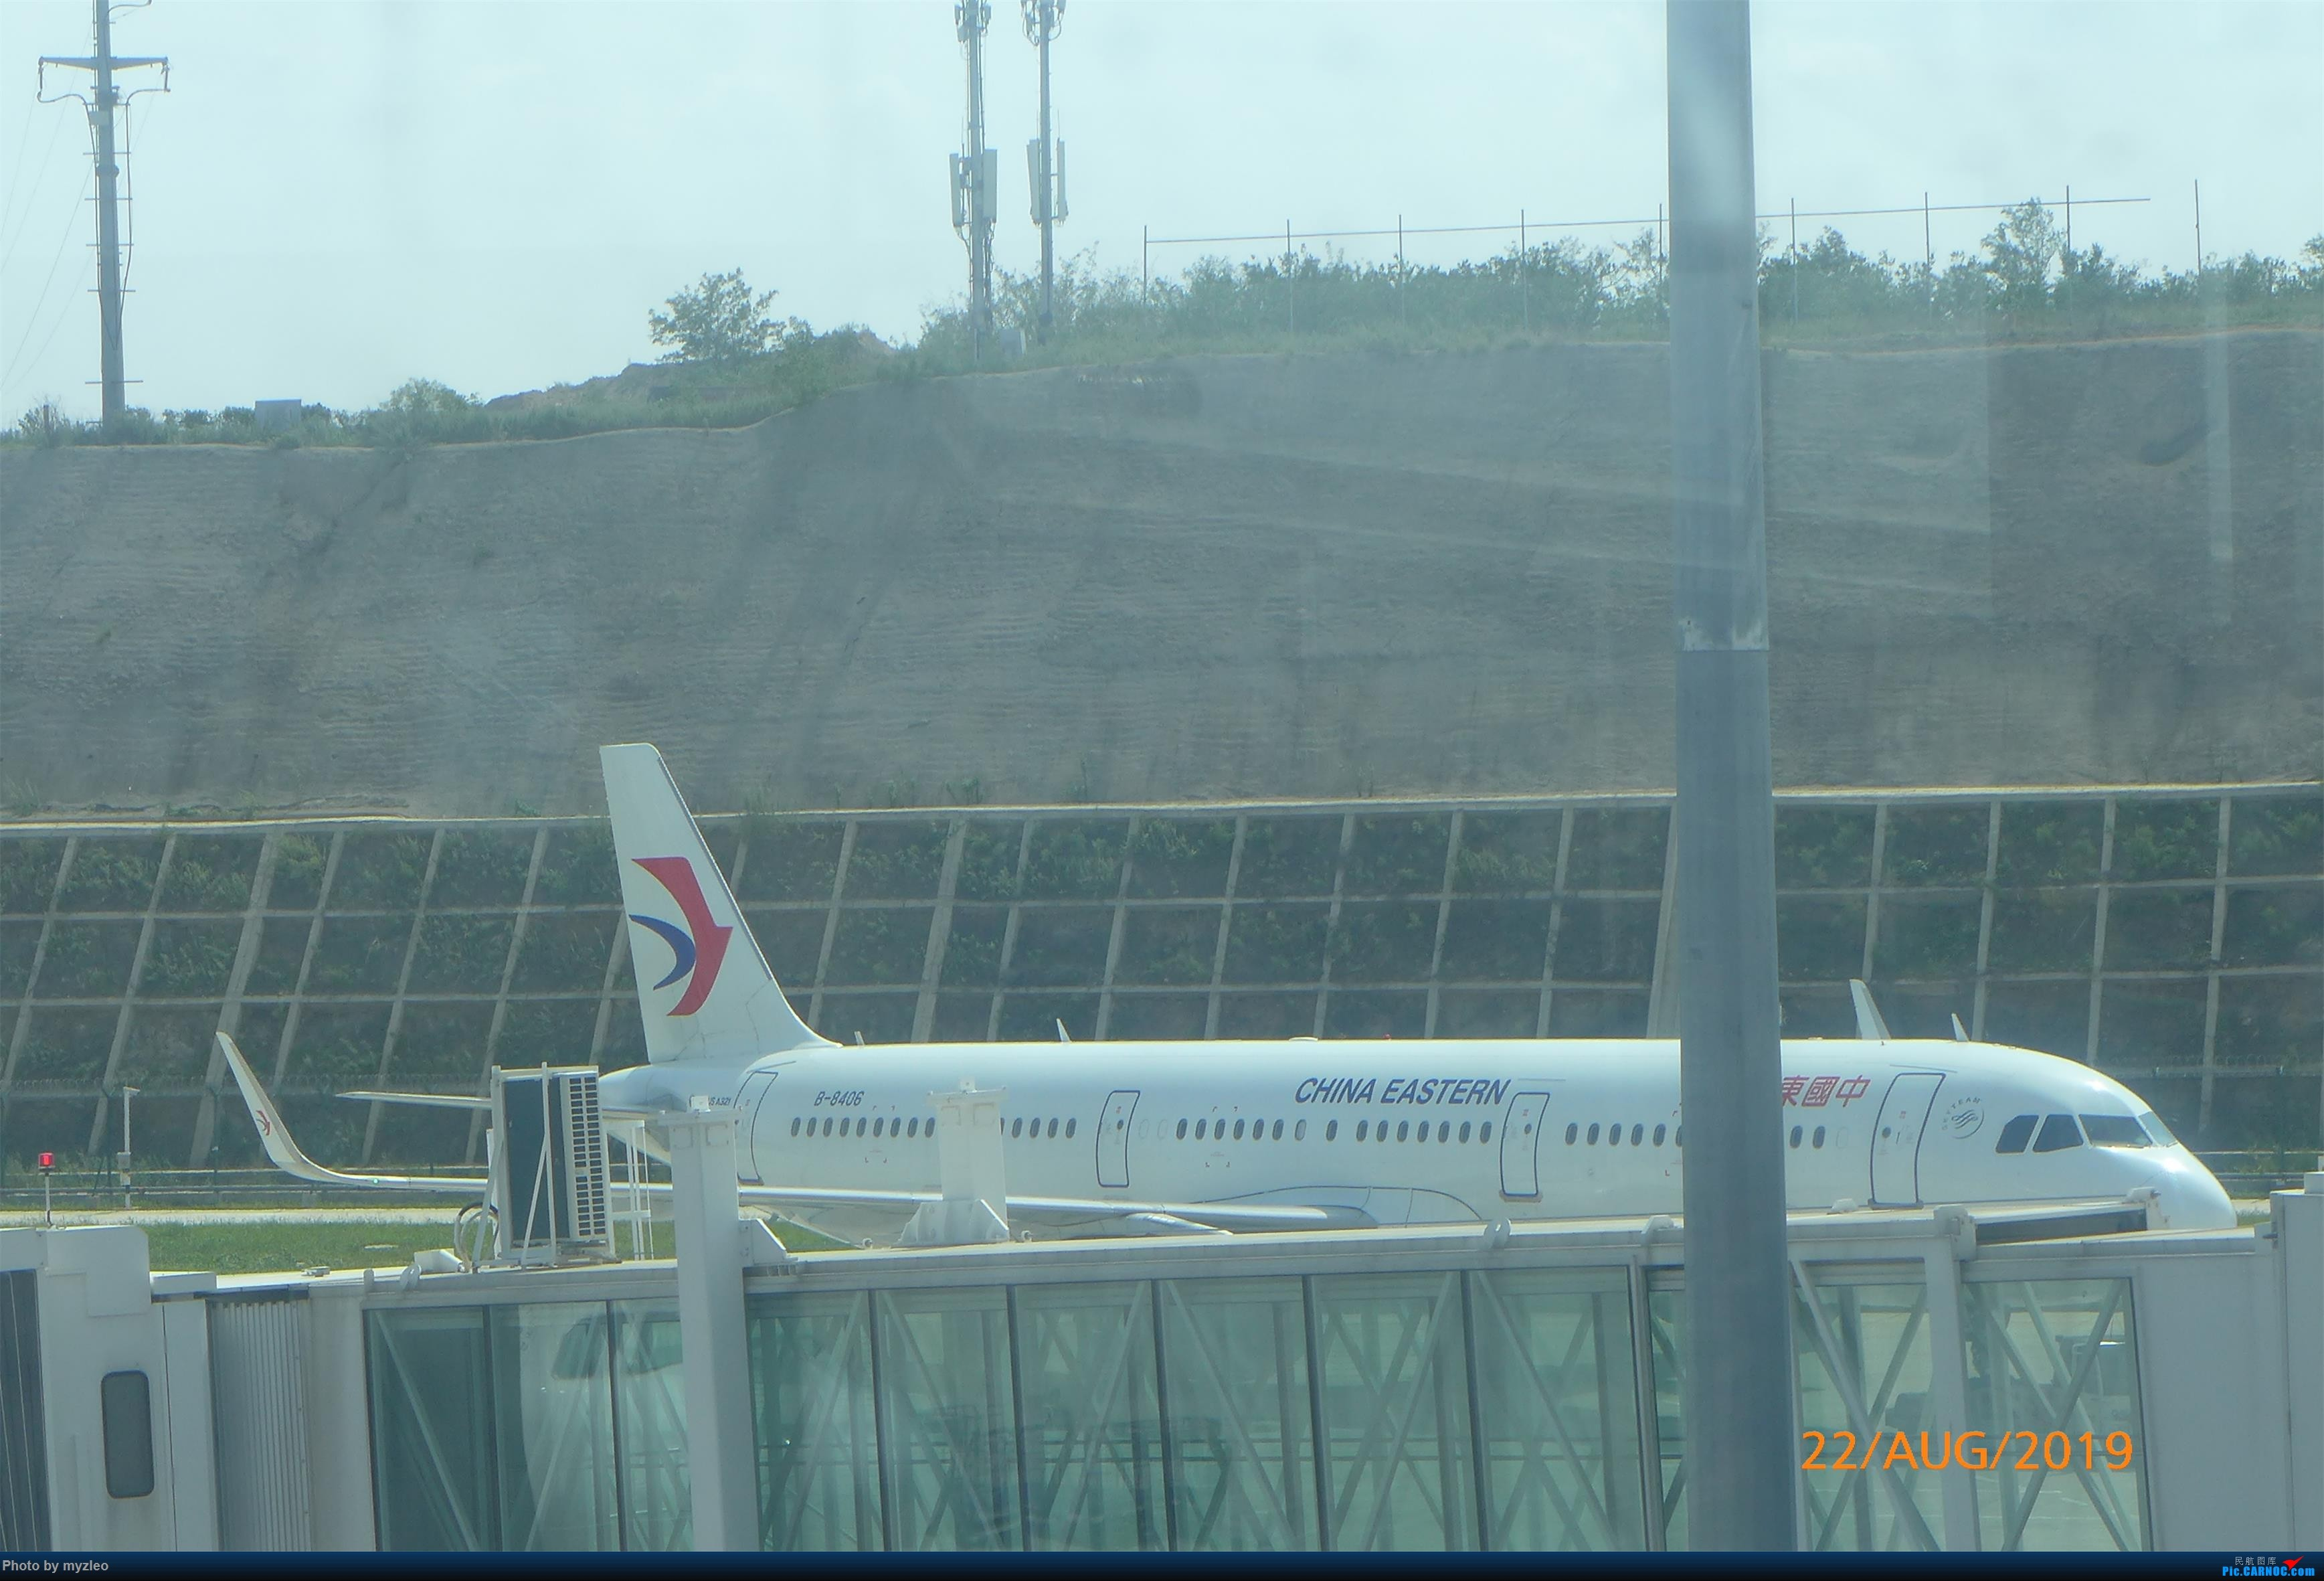 Re:[原创]【myzleo的游记5.2】梦圆一九(2)首访南苑把梦圆,初搭巴航连新缘 AIRBUS A321-200 B-8406 中国烟台蓬莱国际机场